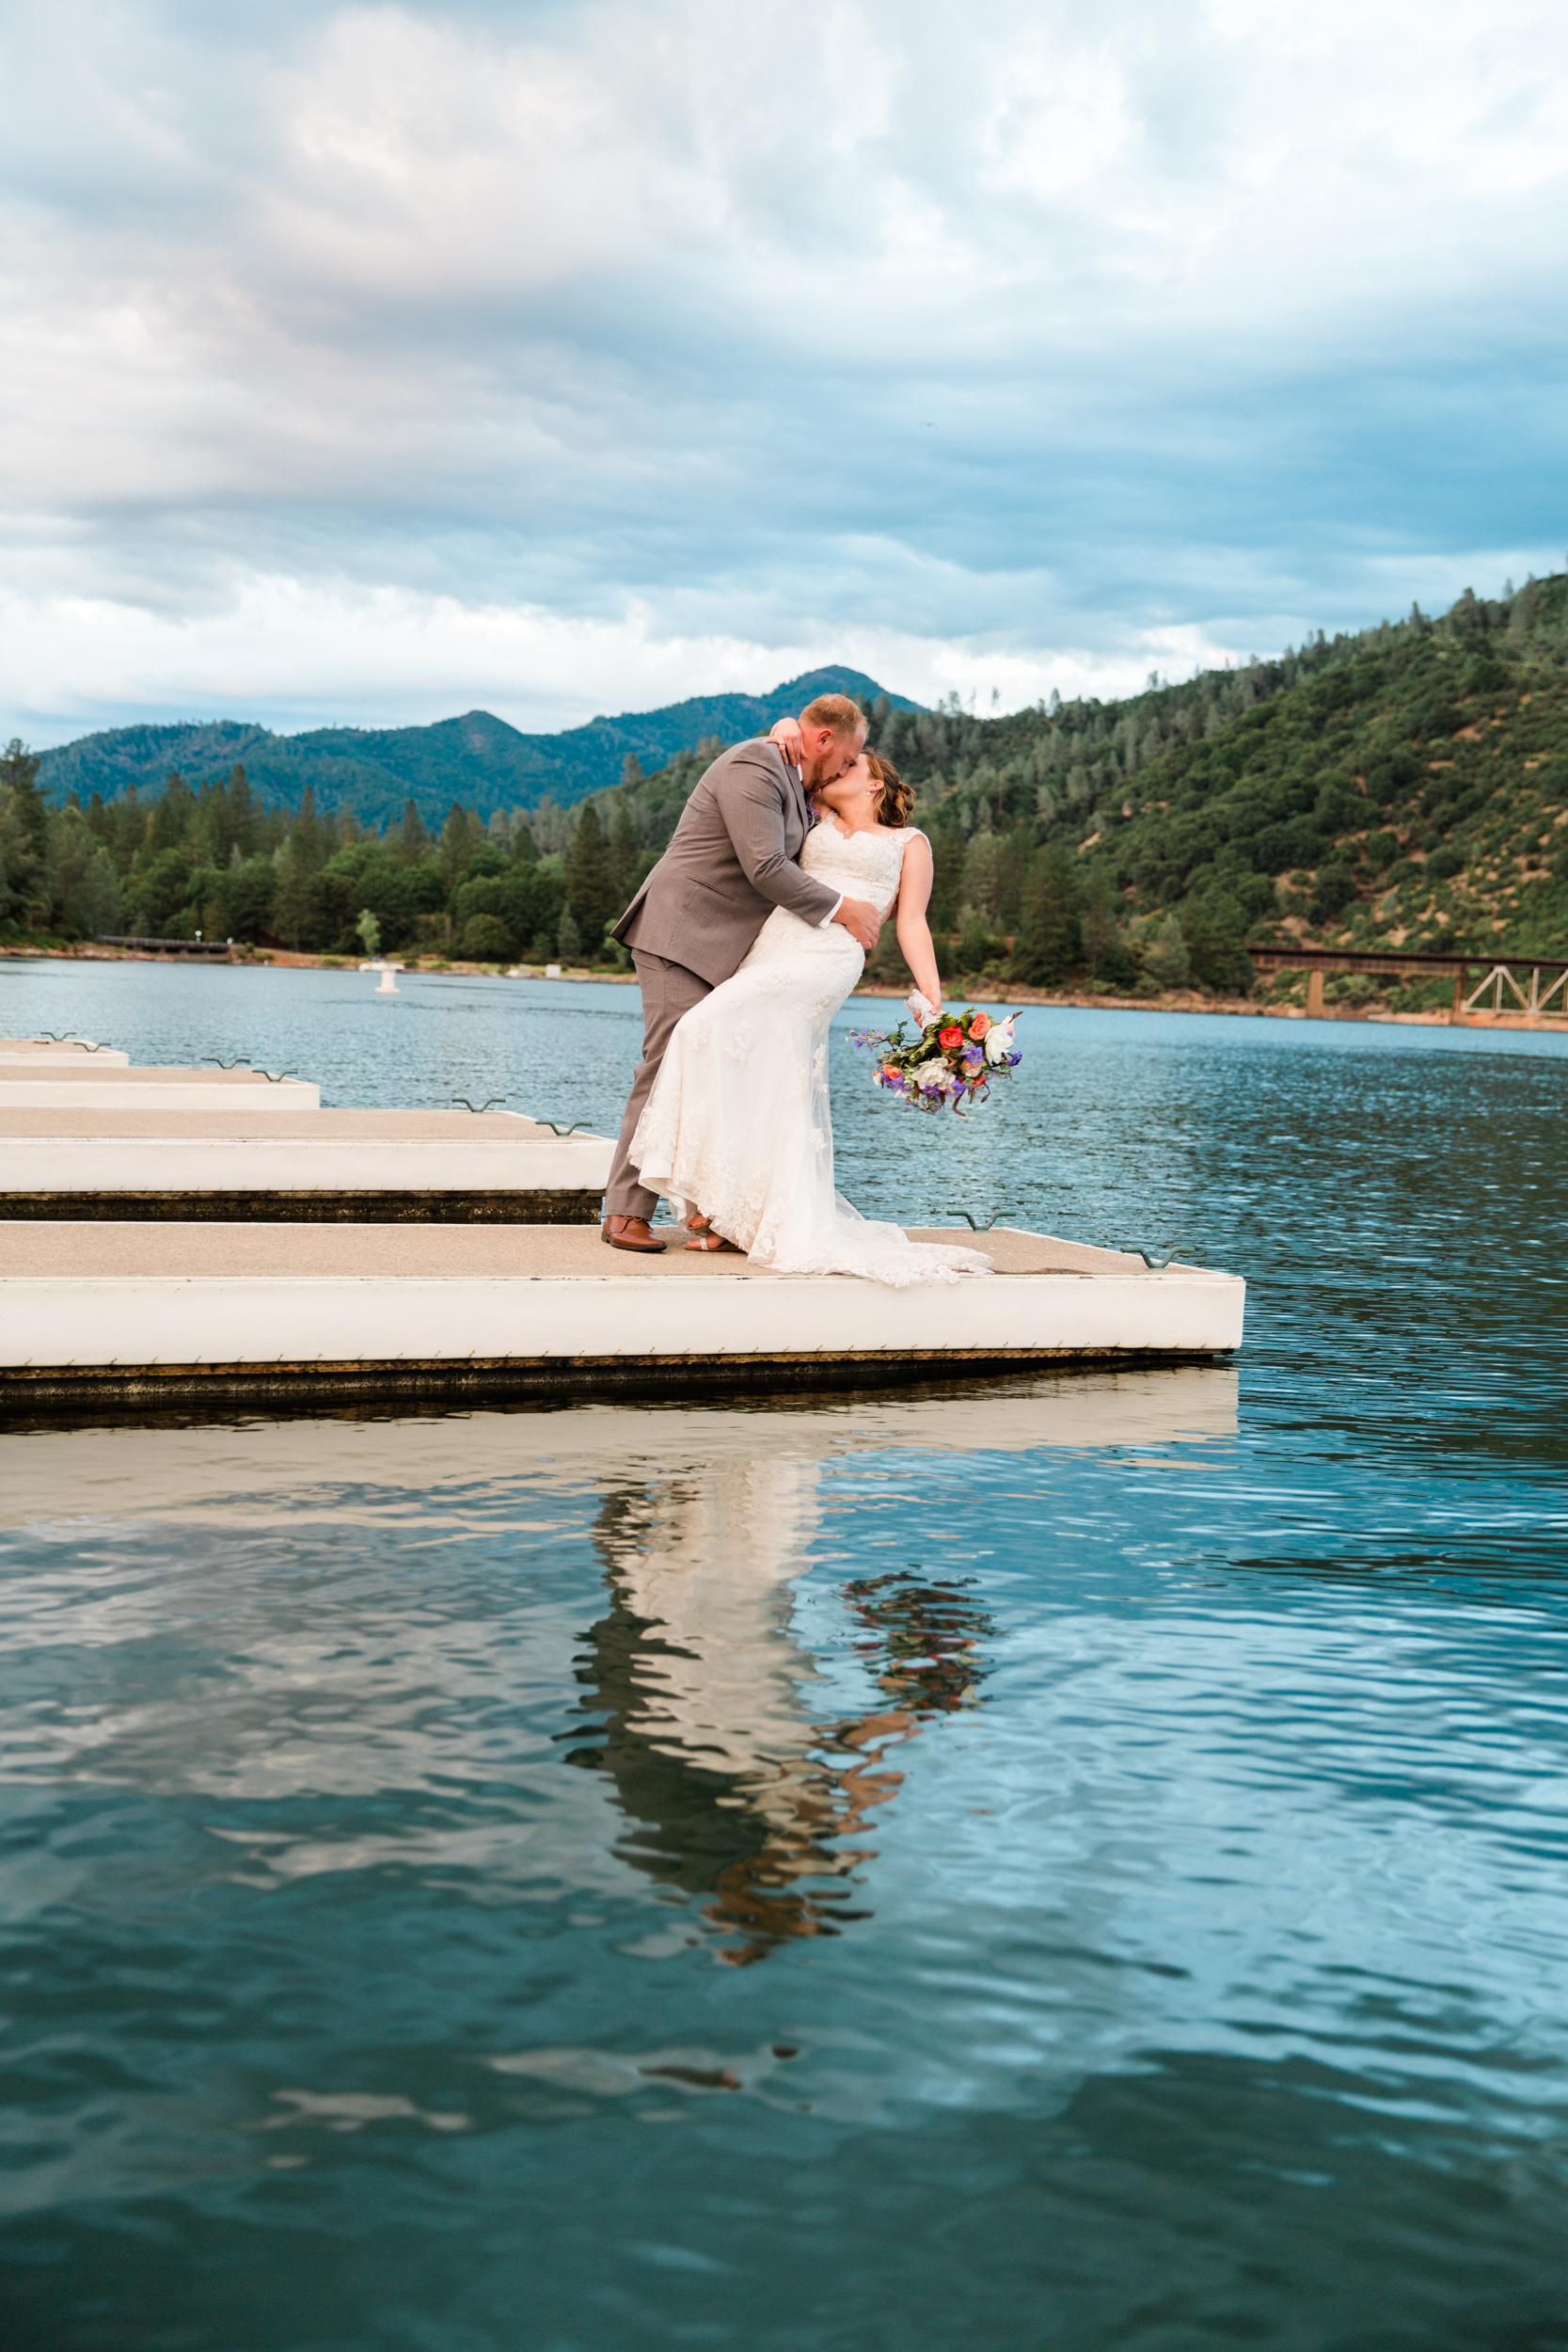 59-3432-jewel-maree-photography-wedding.jpg